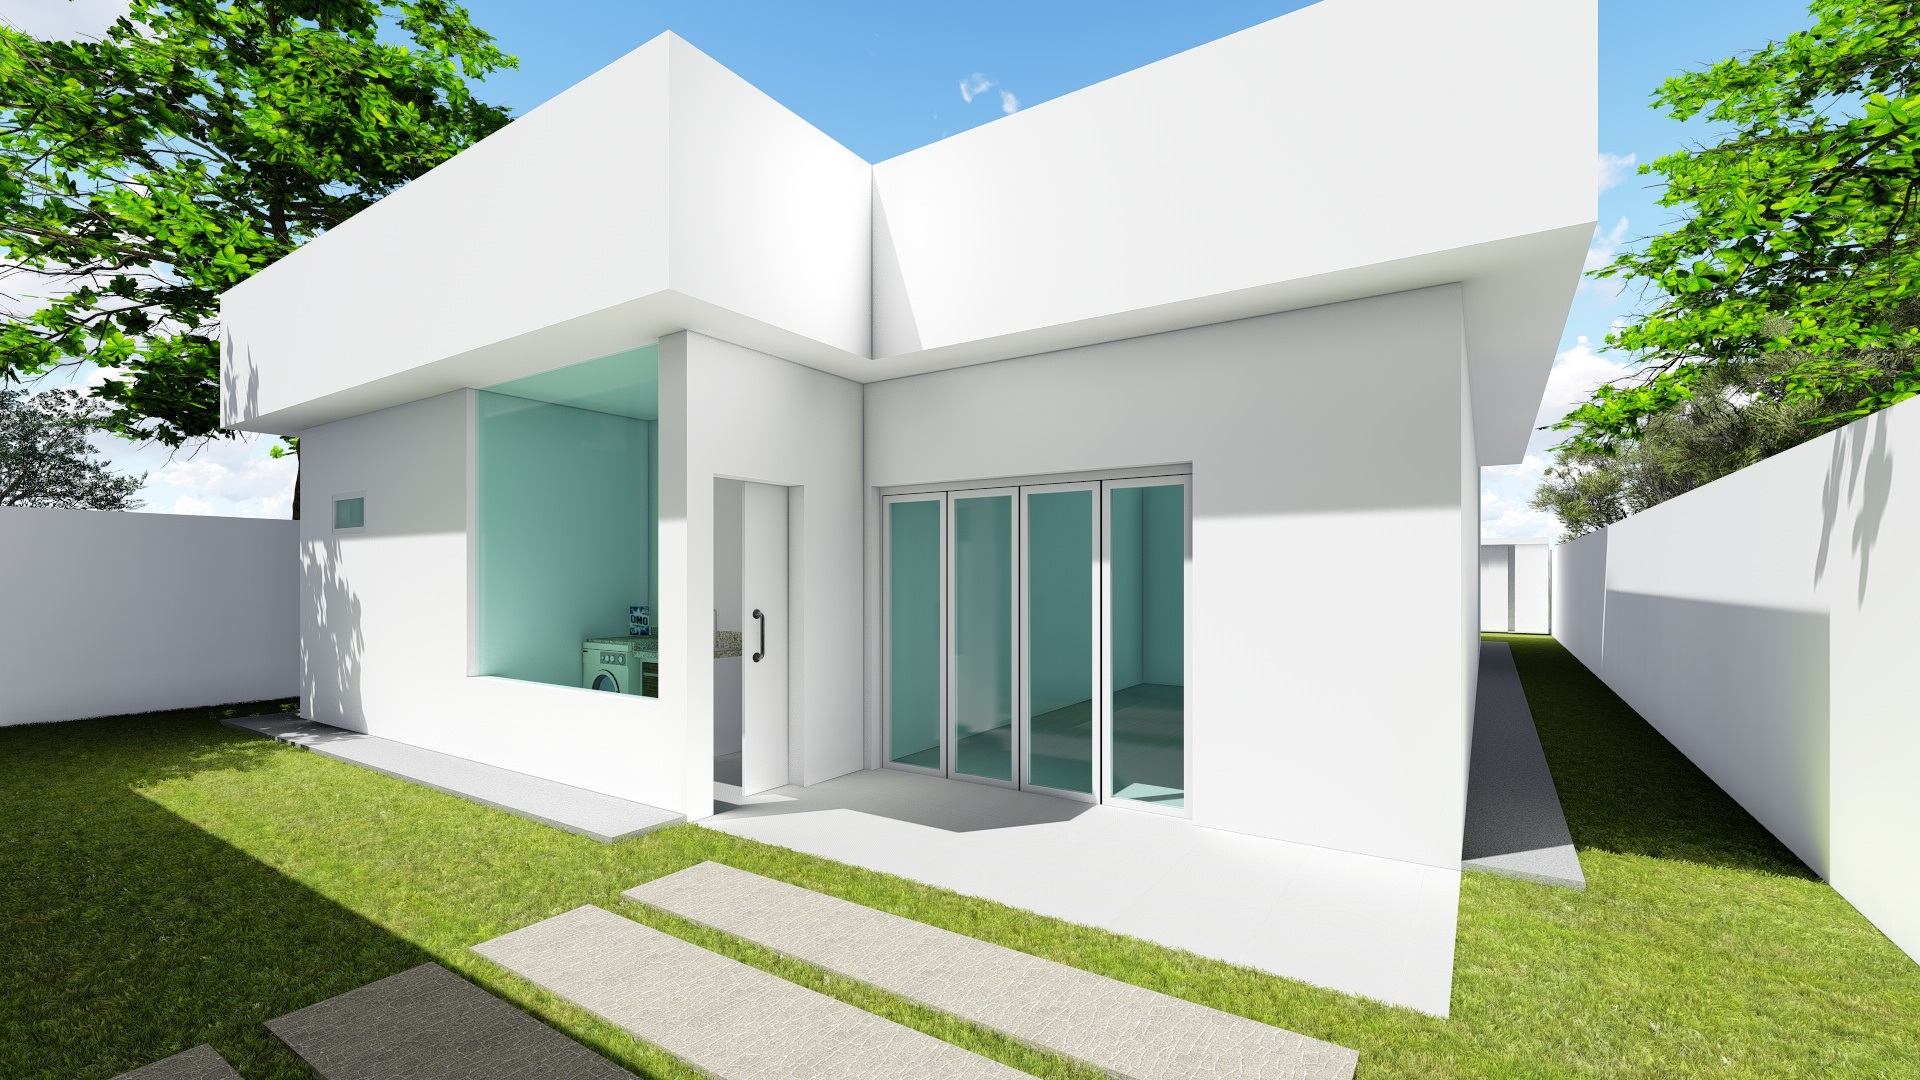 construção-projeto-condominio_alto_da_boa_vista_-_CAVB_(3)